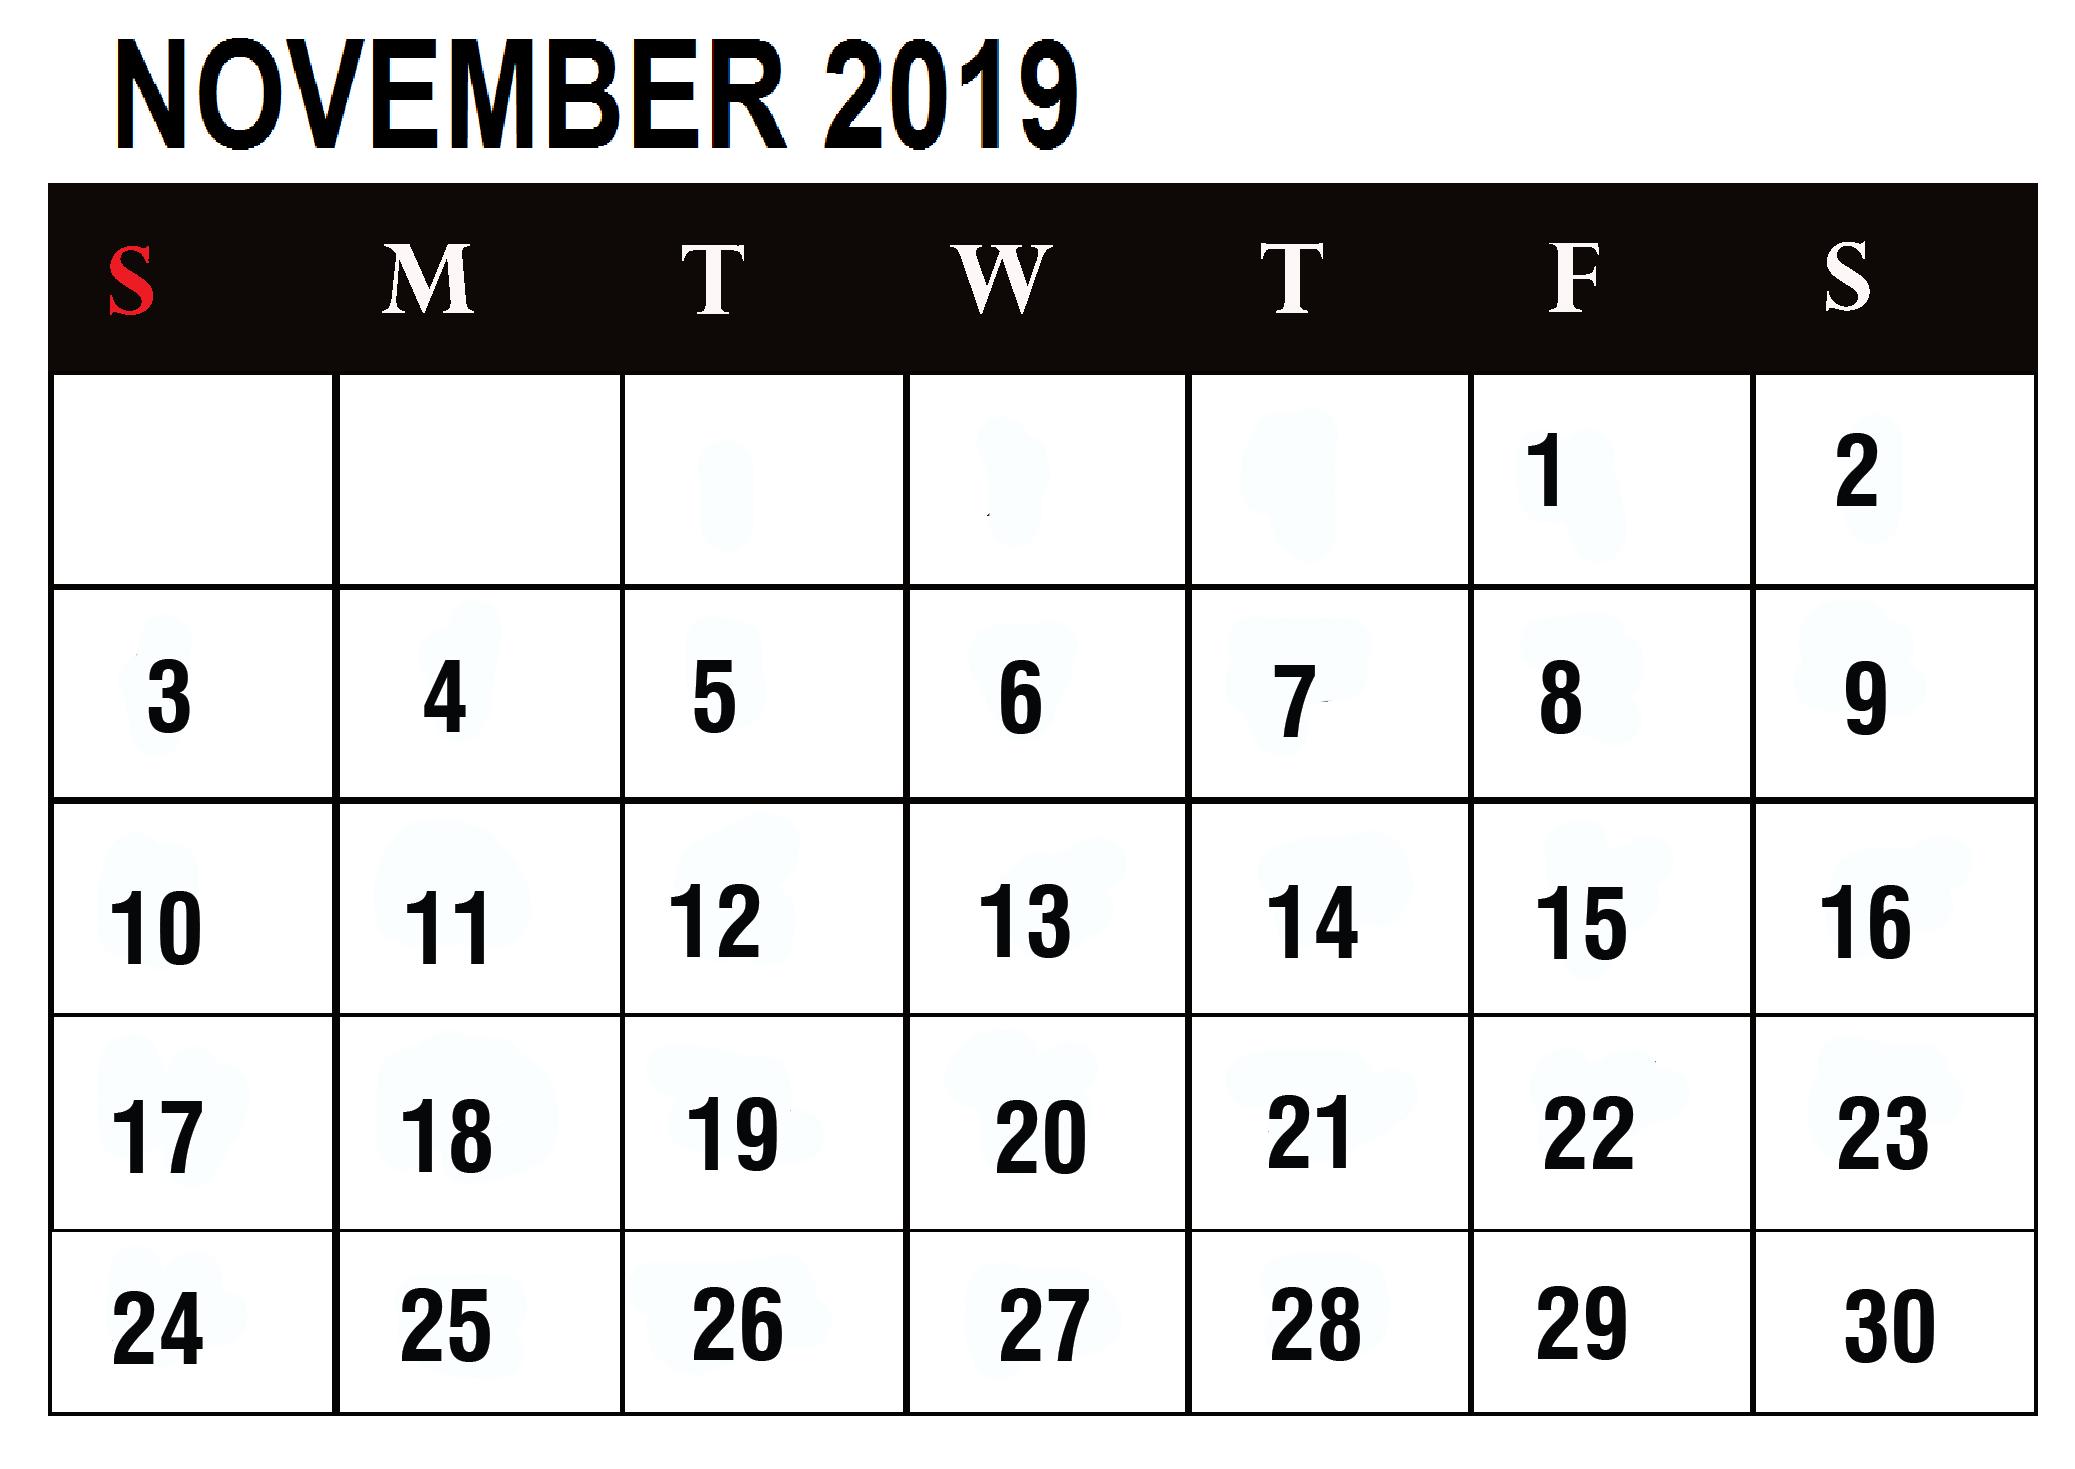 November 2019 Calendar Template For Google Sheets - Latest